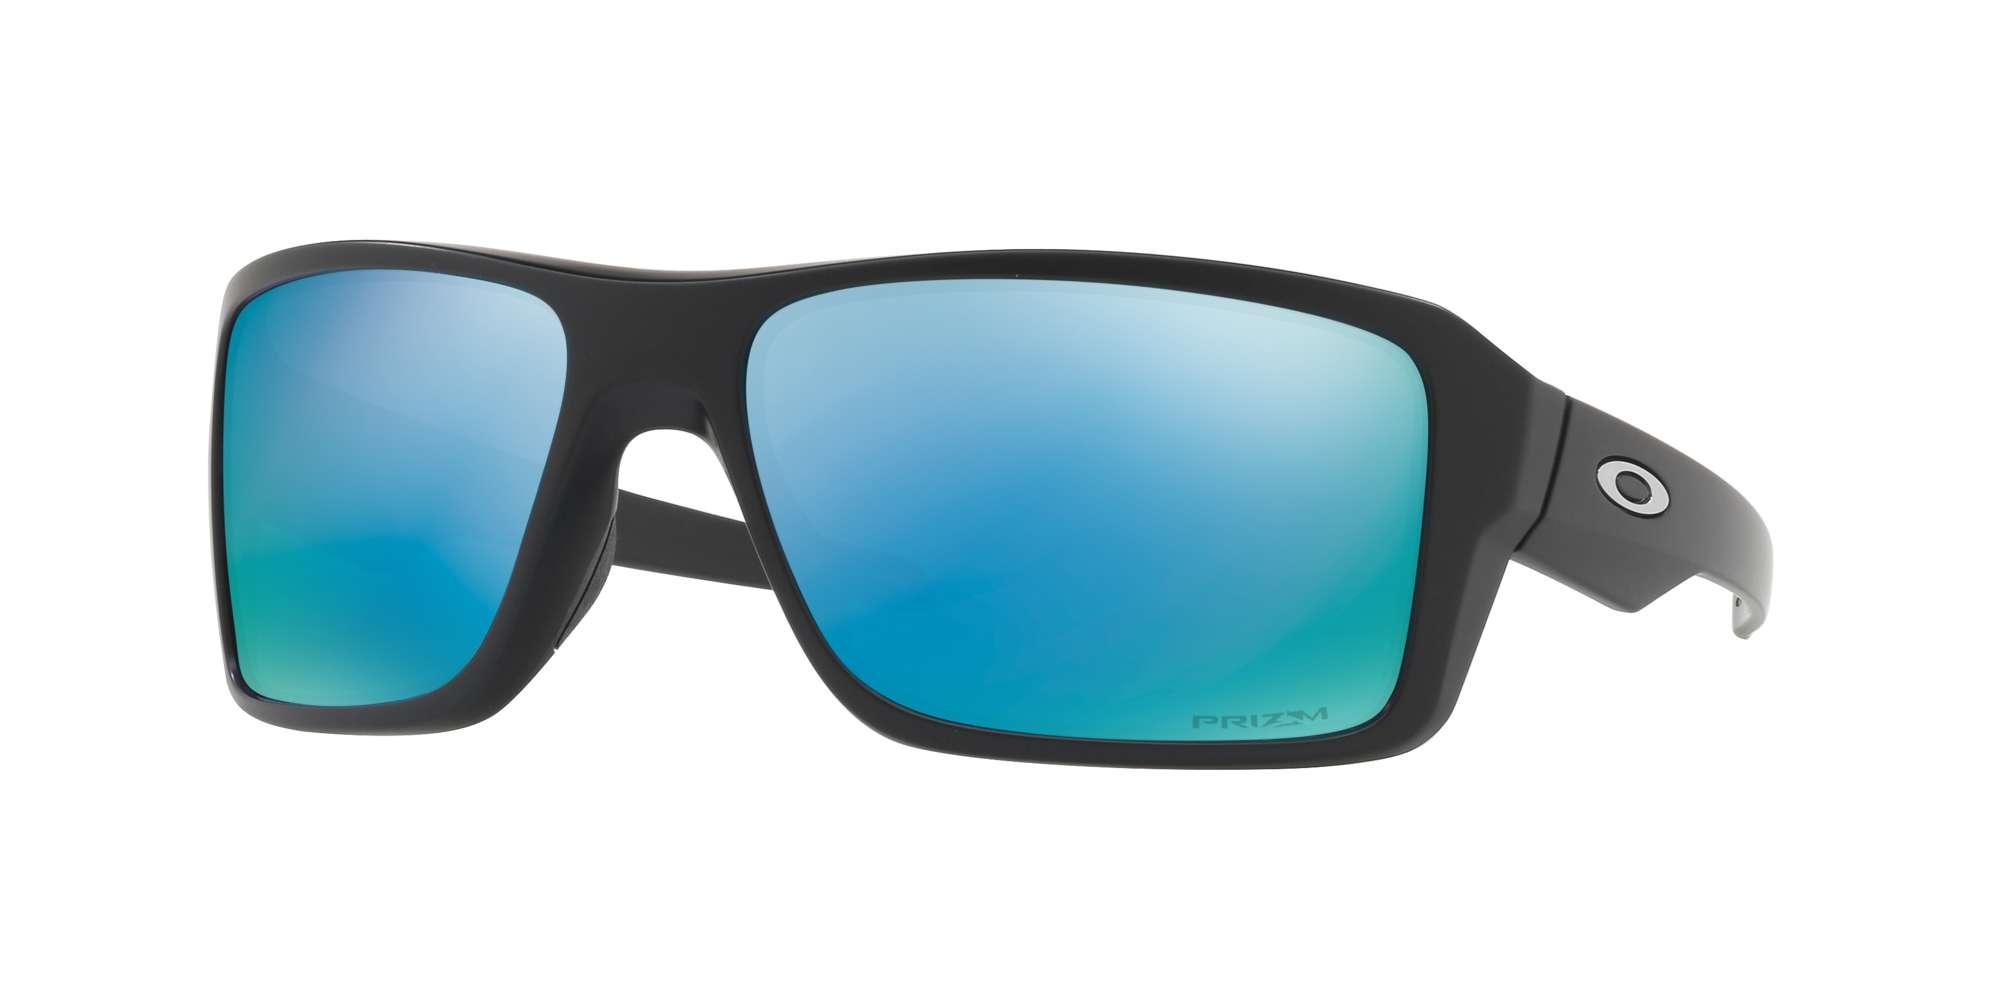 MATTE BLACK / PRIZM DEEP WATER POLARIZED lenses